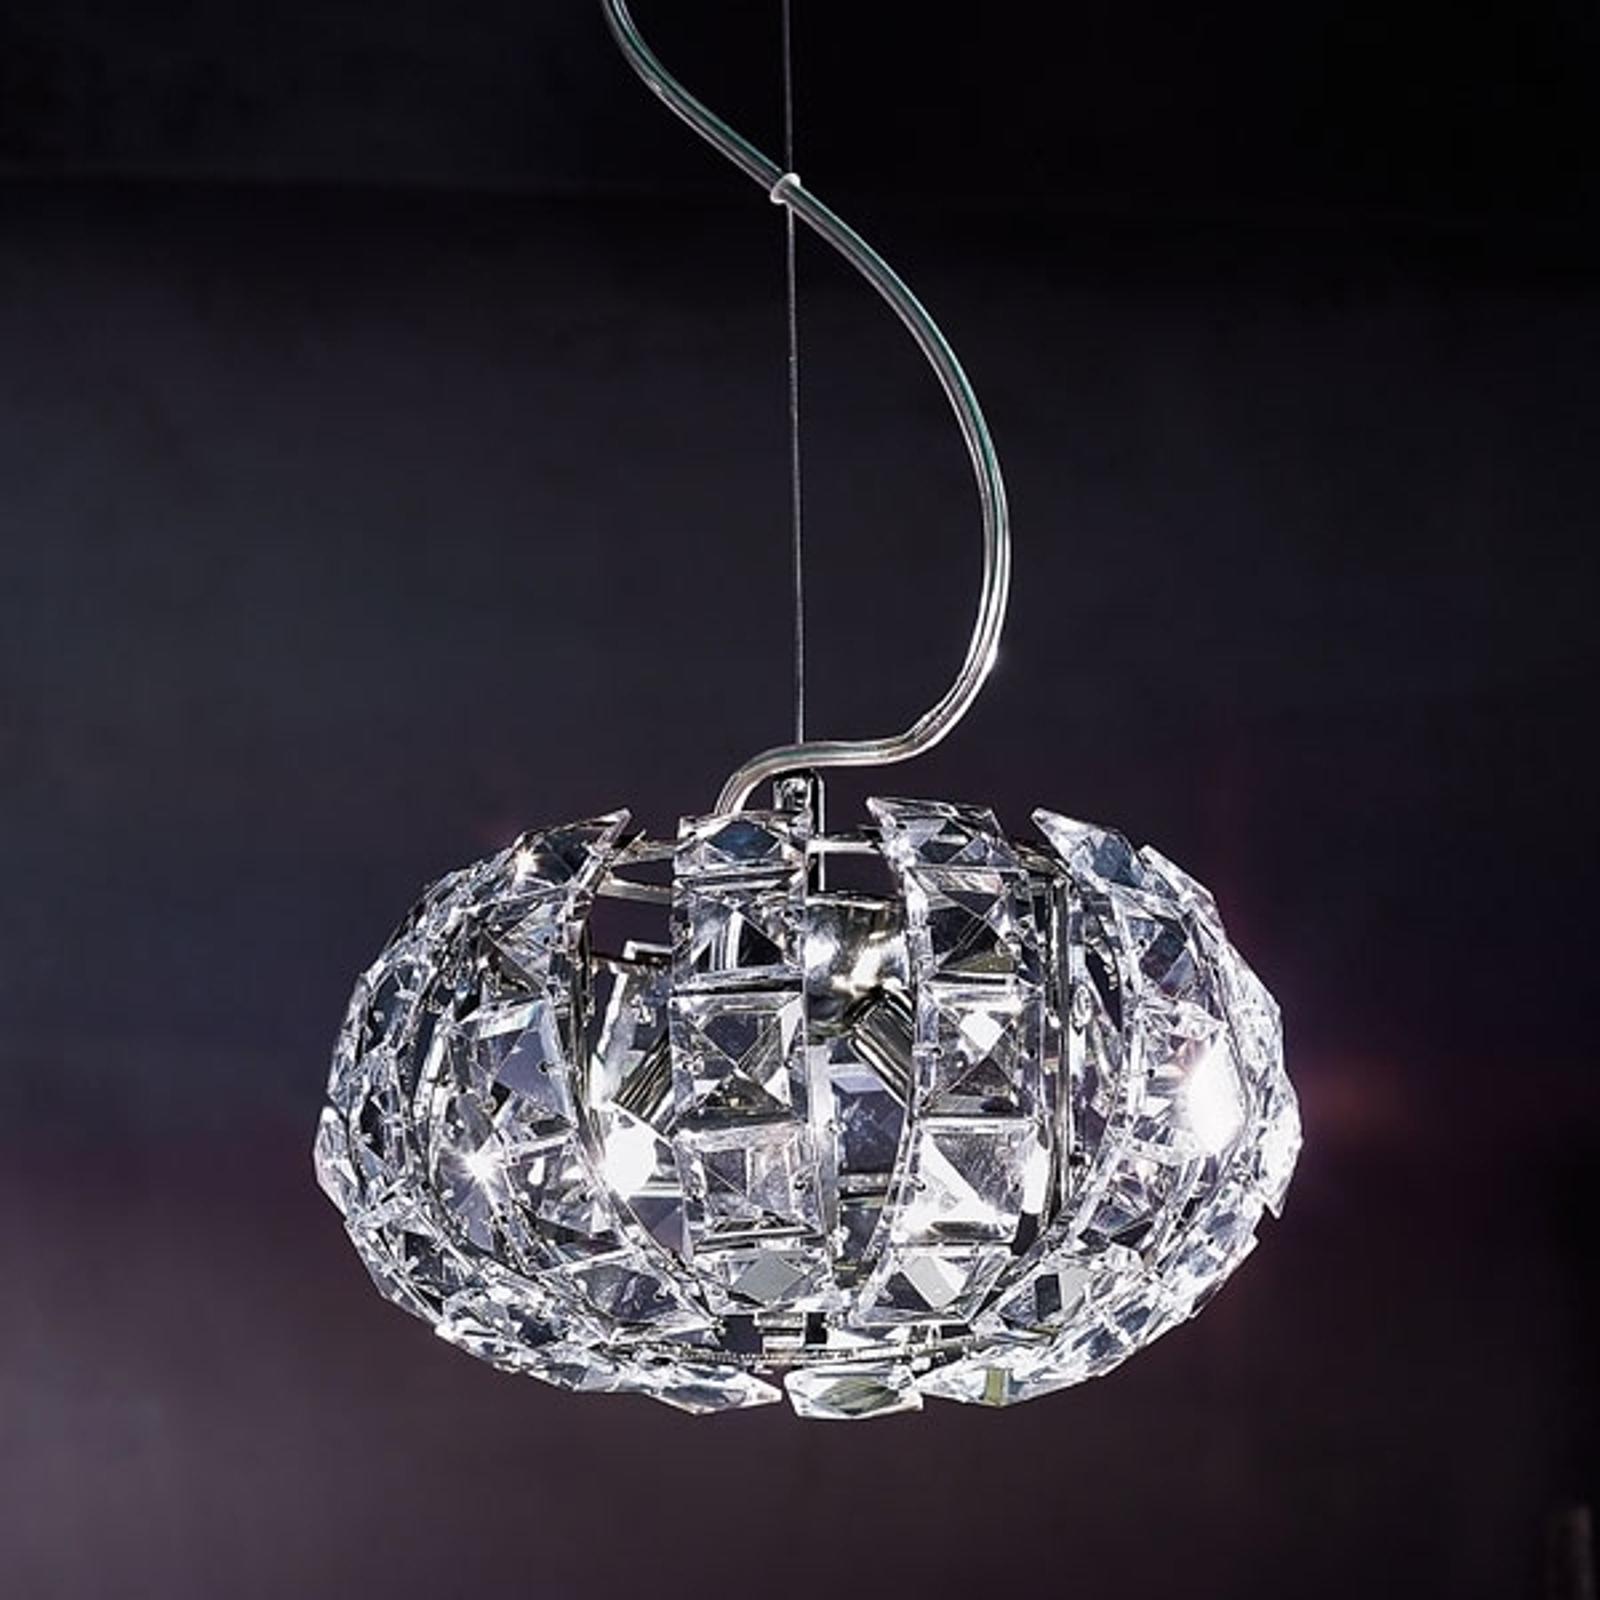 Lampa wisząca ze szklanymi kryształkami ANDROMEDA